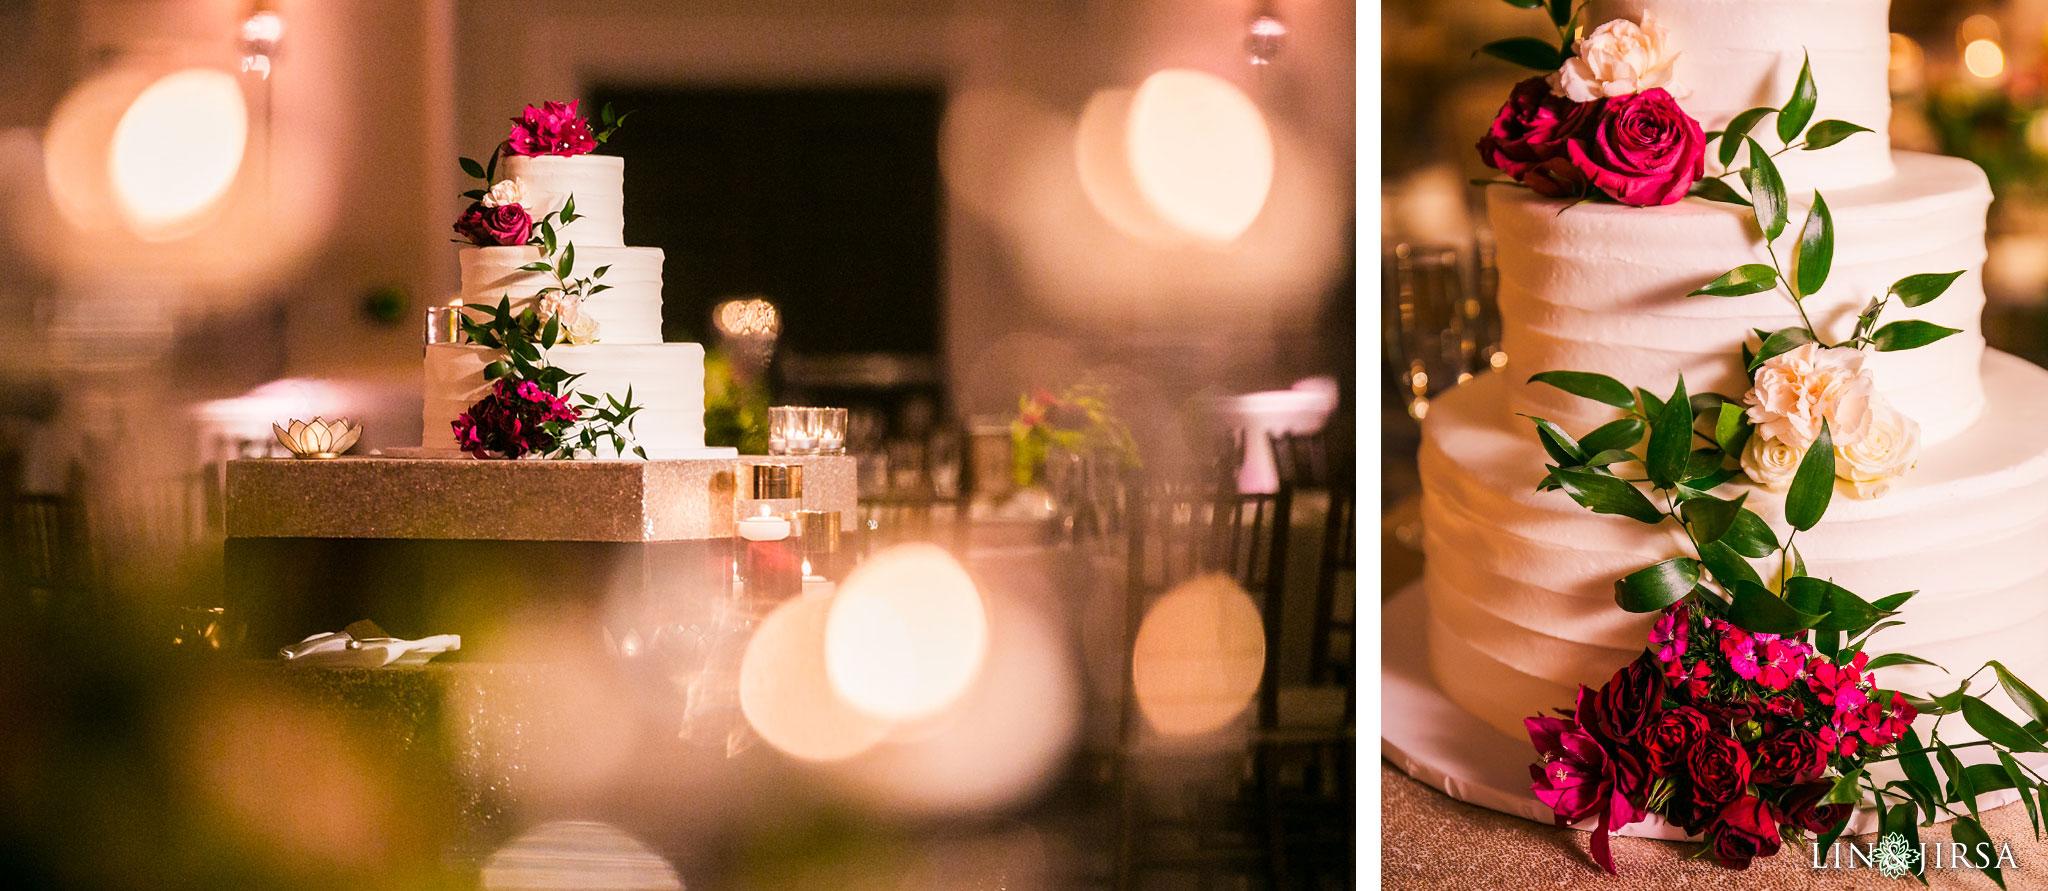 28 laguna cliffs marriott dana point indian wedding reception photography